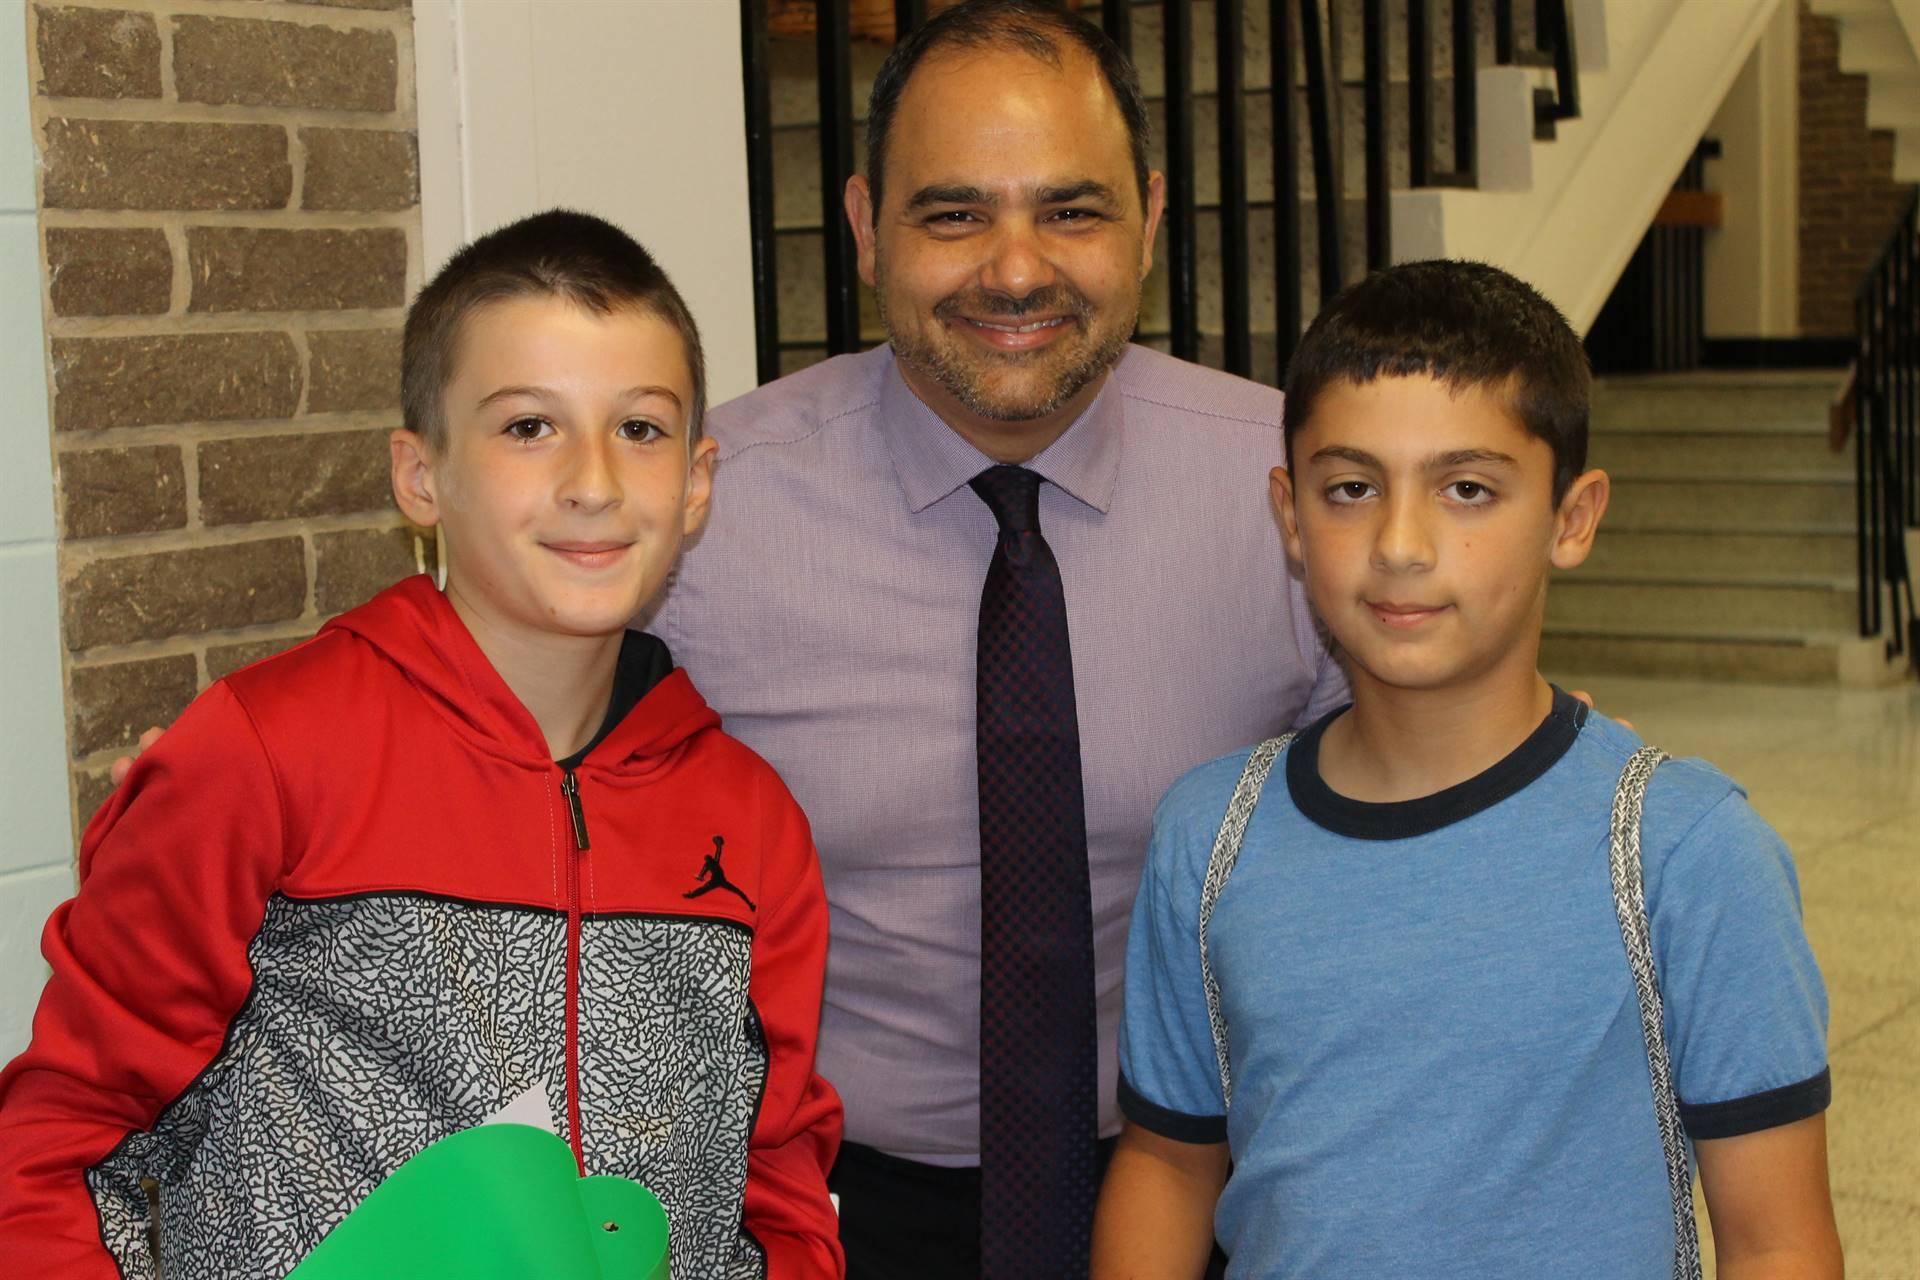 Principal, Mr. Davidson, with 2 students